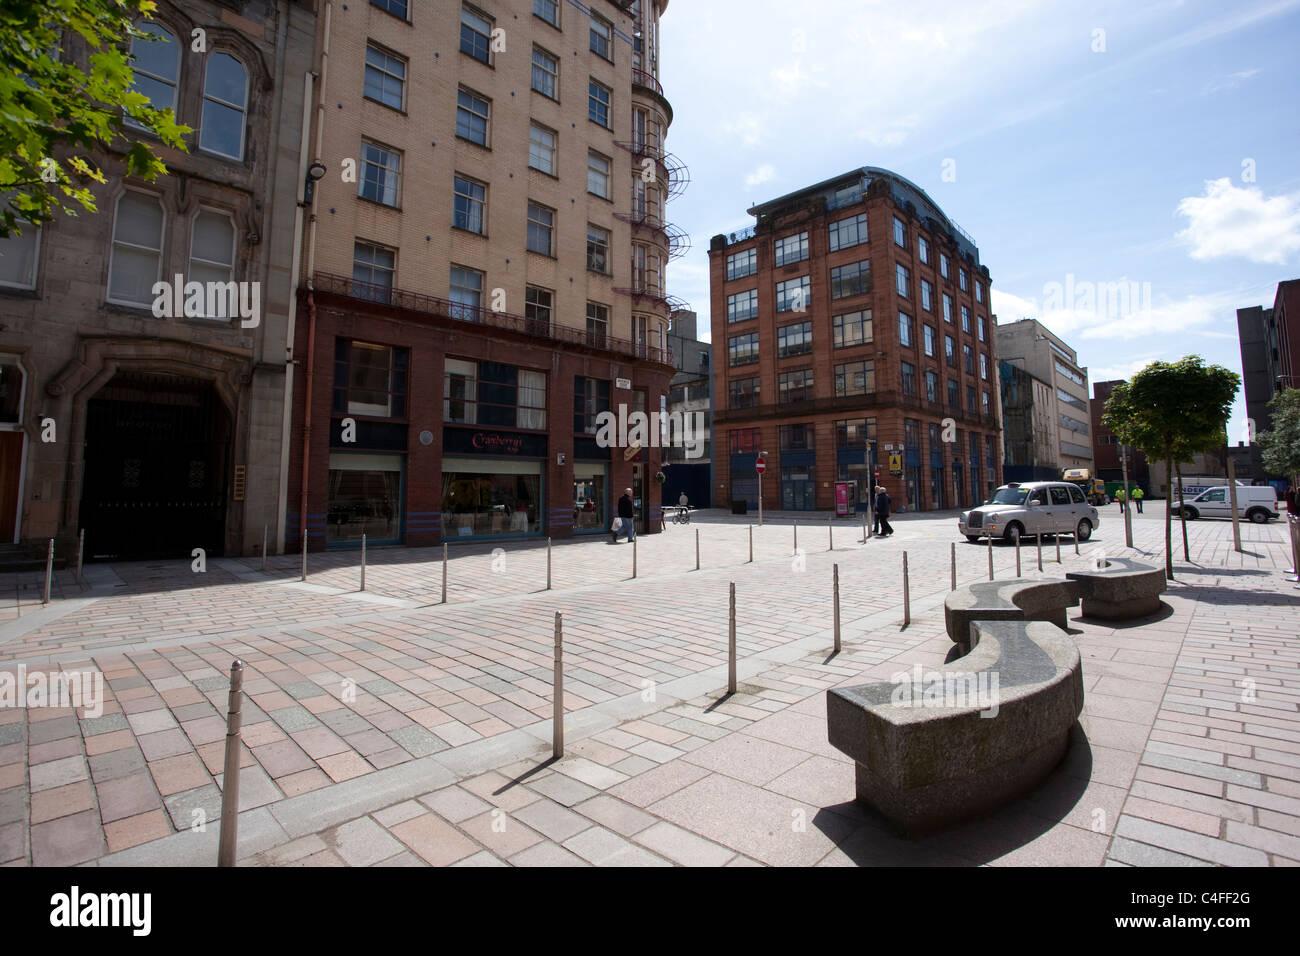 Brunswick Street in the Merchant City area of Glasgow, Scotland. Photo:Jeff Gilbert - Stock Image